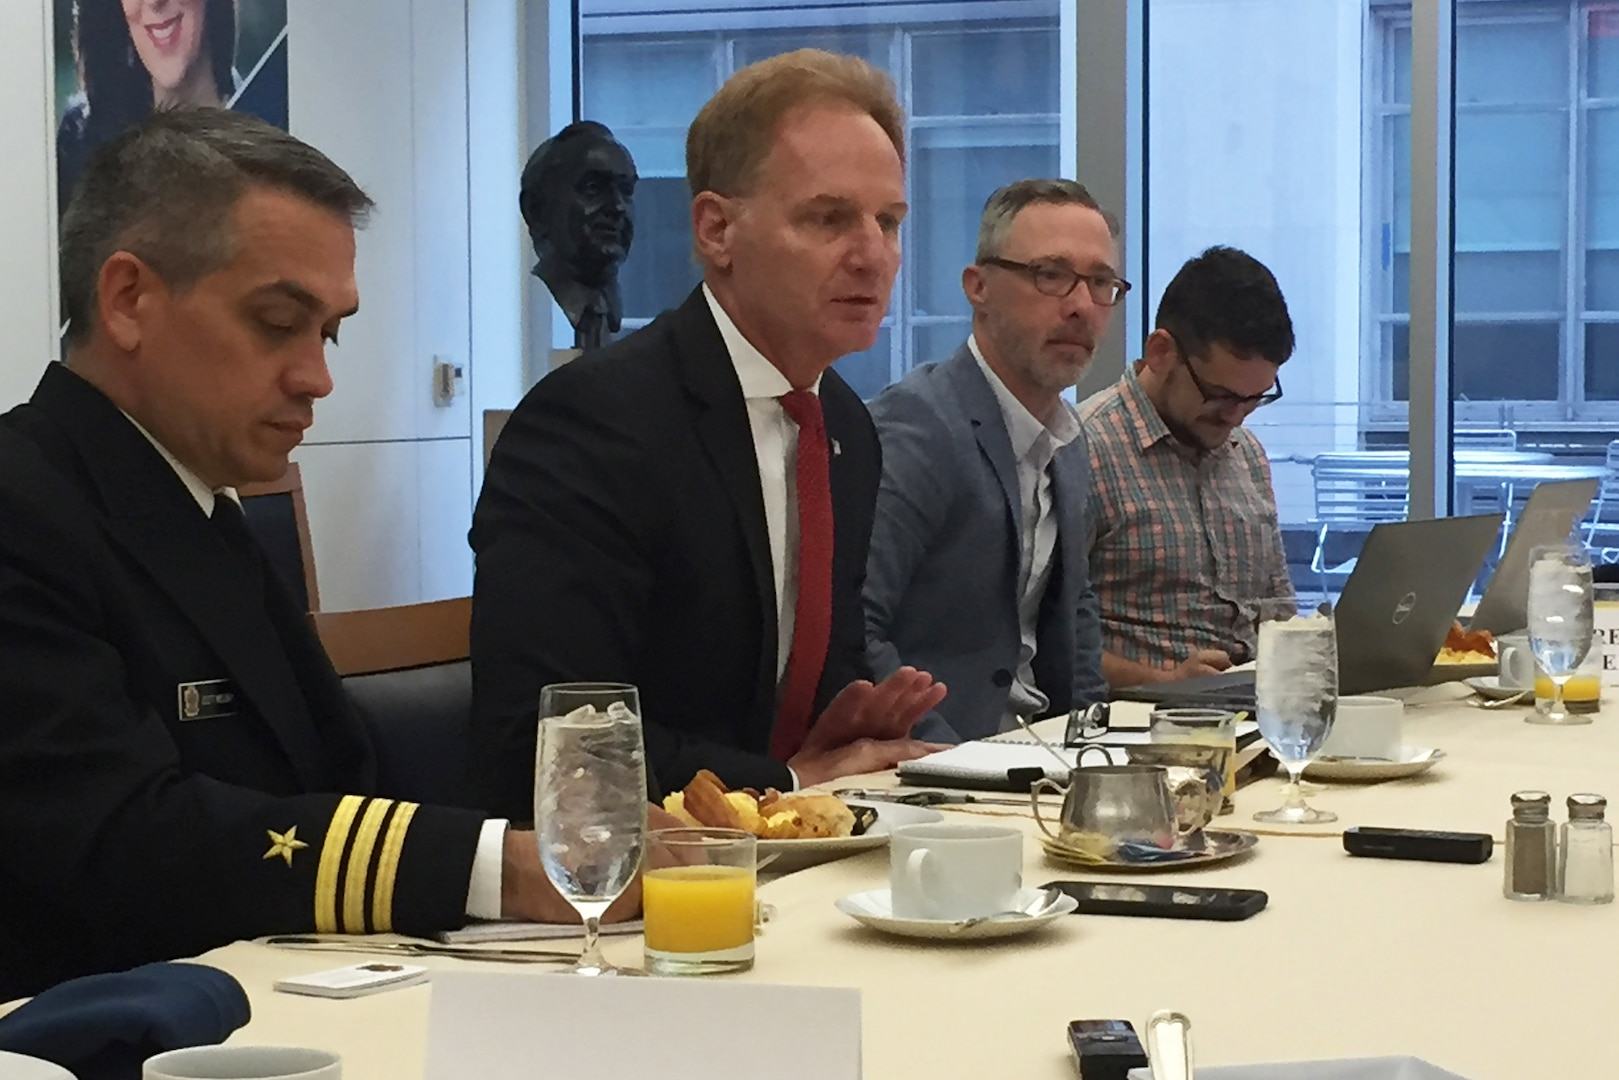 U.S. Could Help Pacific Allies Build Capabilities, Navy Undersecretary Says